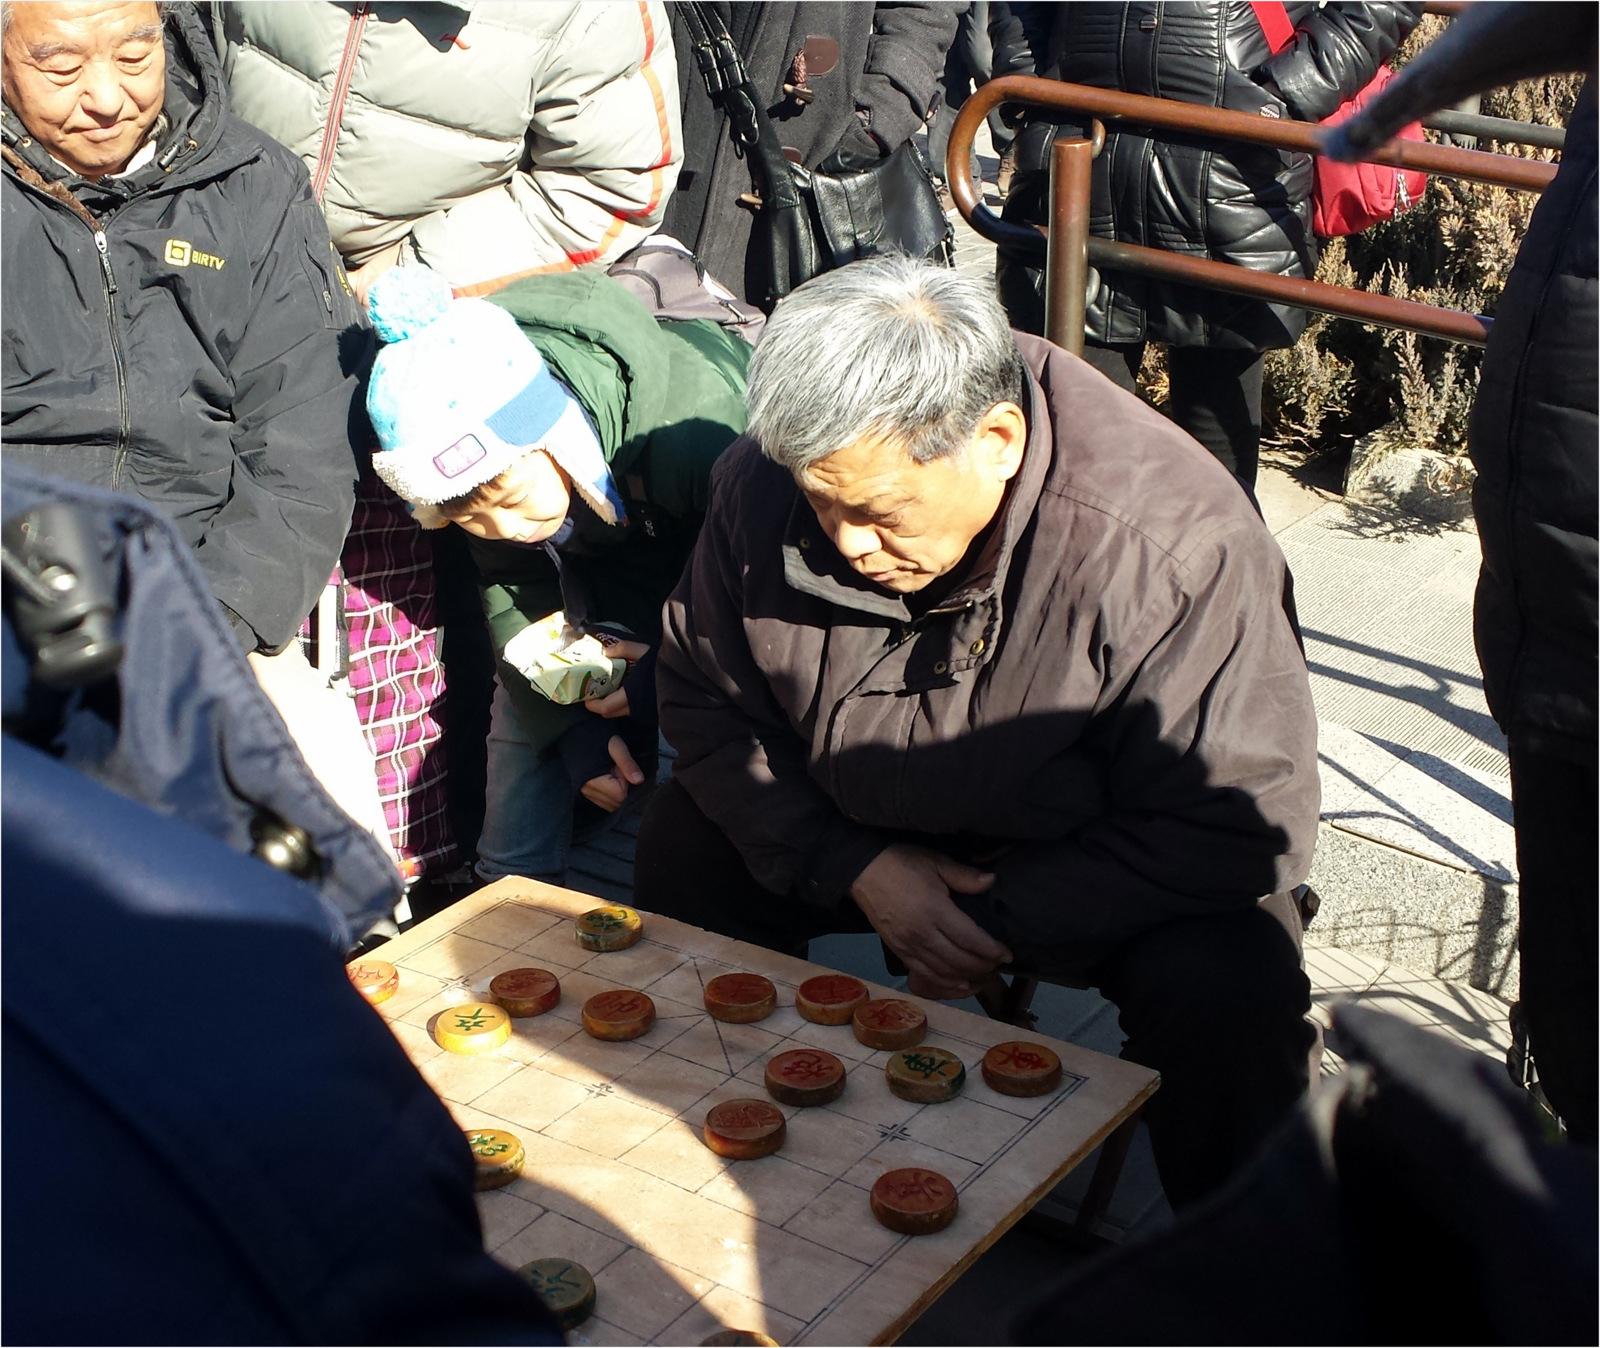 China - Beijing - Temple of heaven - Games